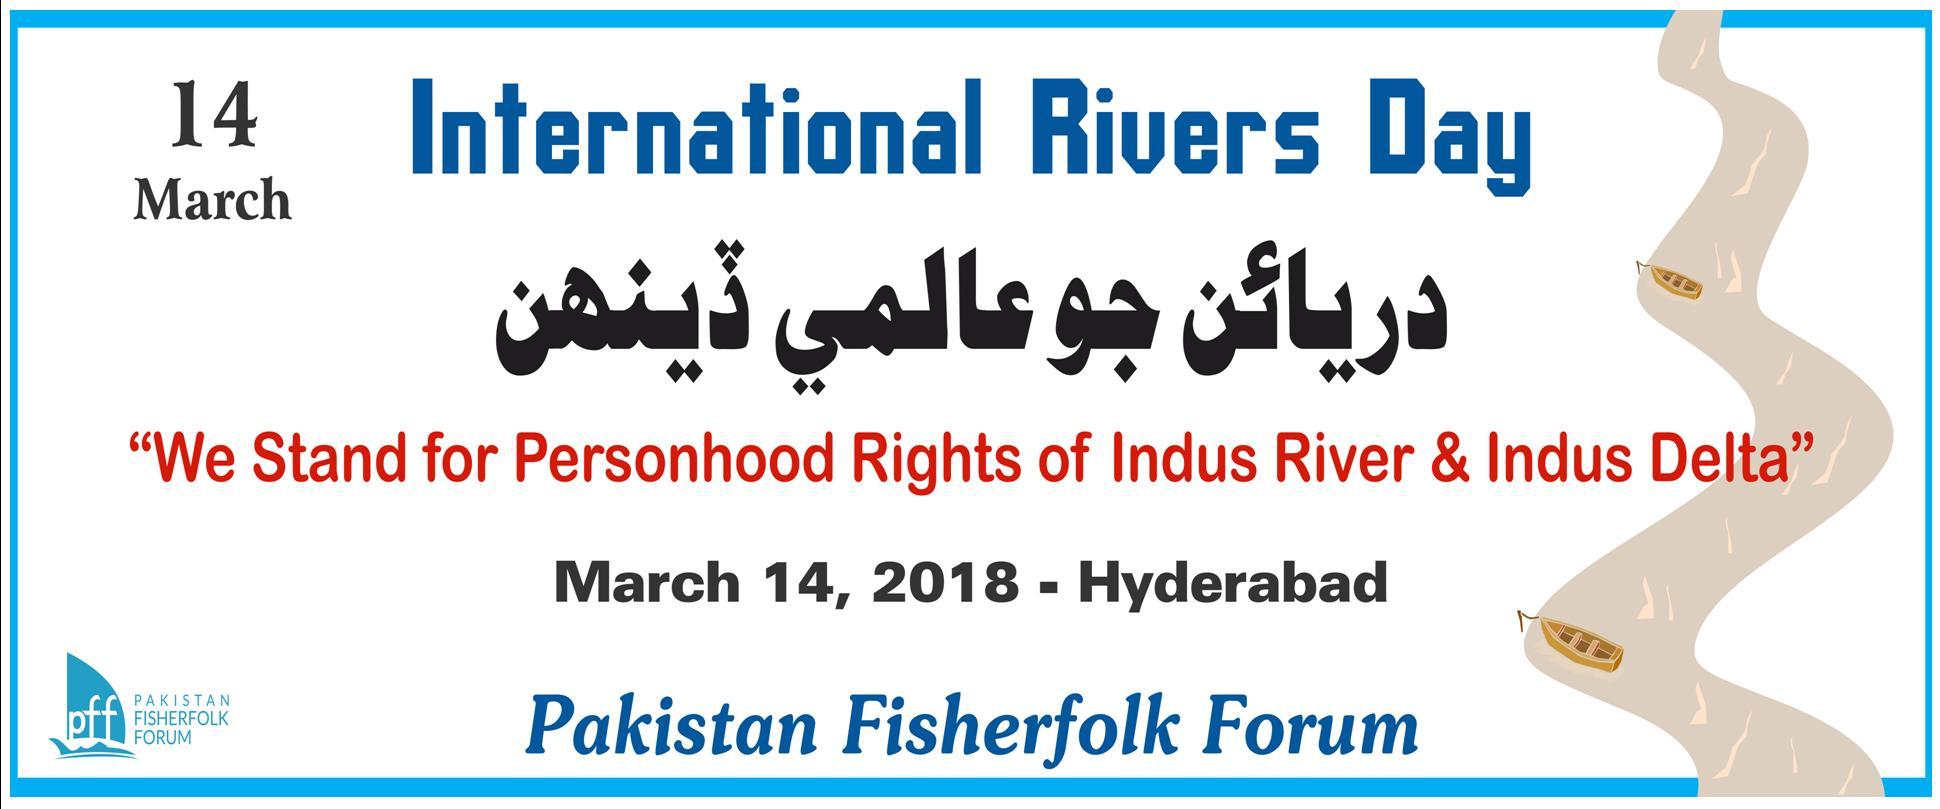 Pakistan FisherFolk Forum